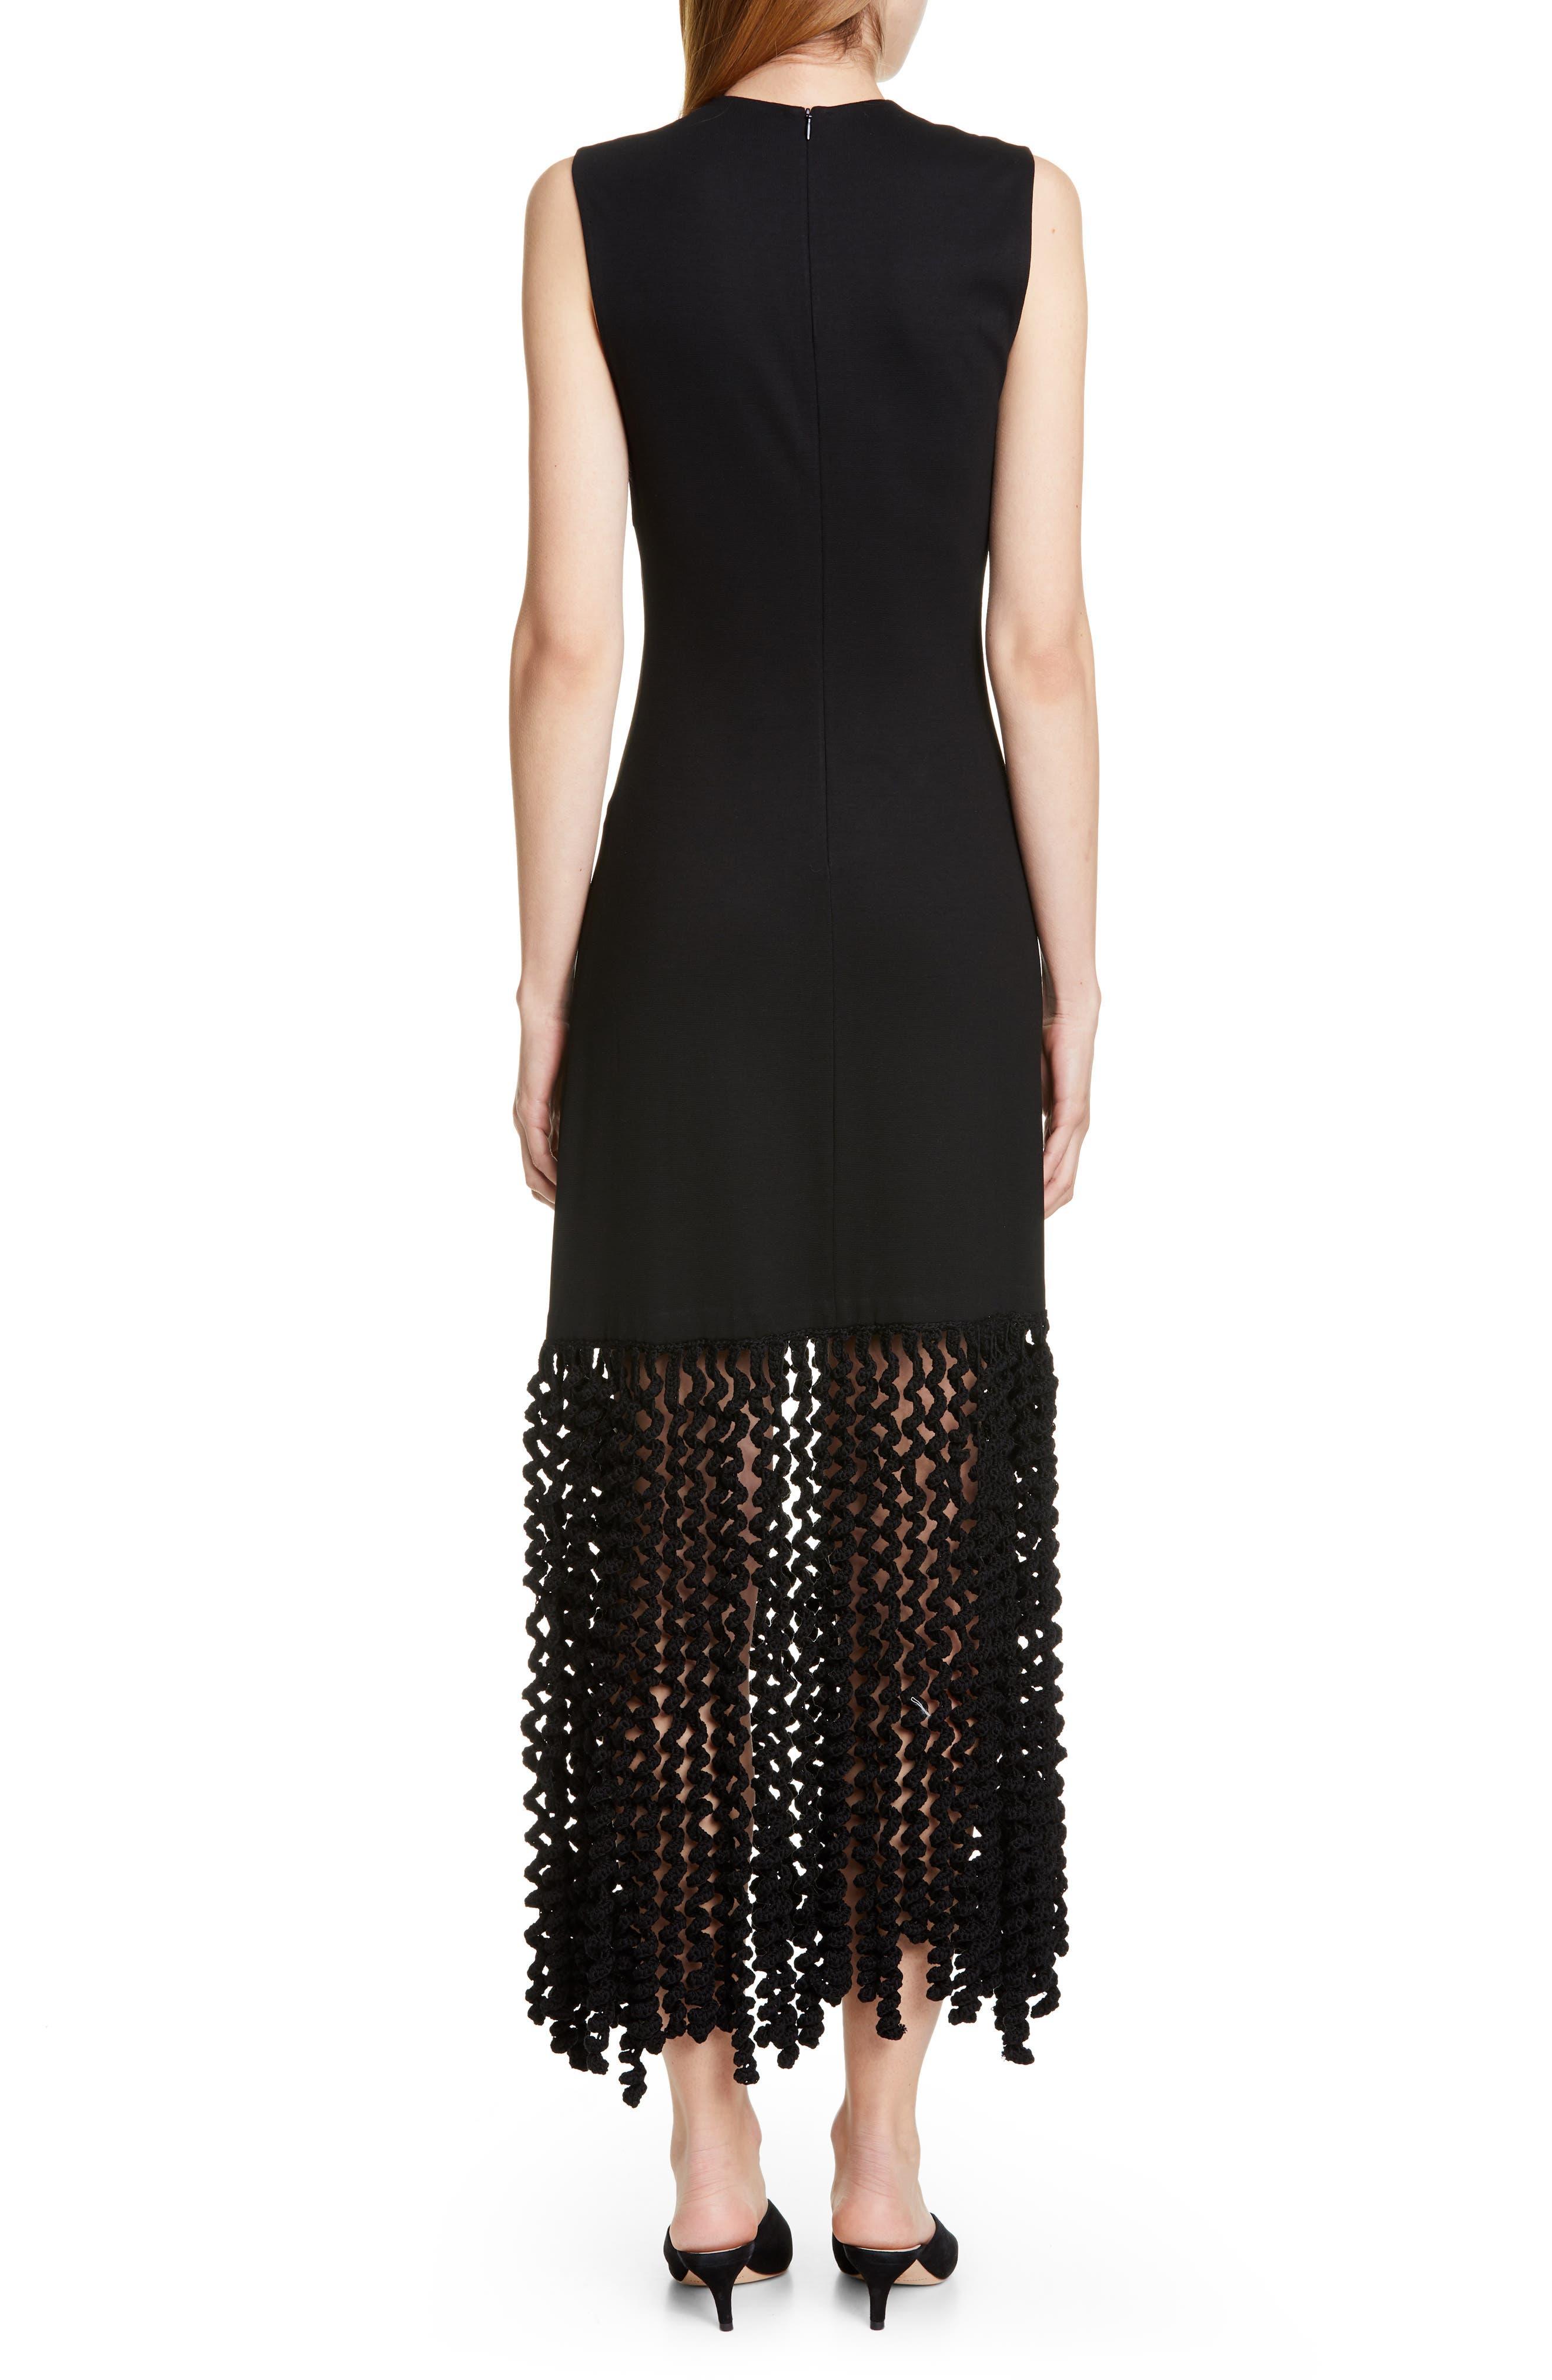 ROSETTA GETTY, Spiral Fringe Maxi Dress, Alternate thumbnail 2, color, BLACK